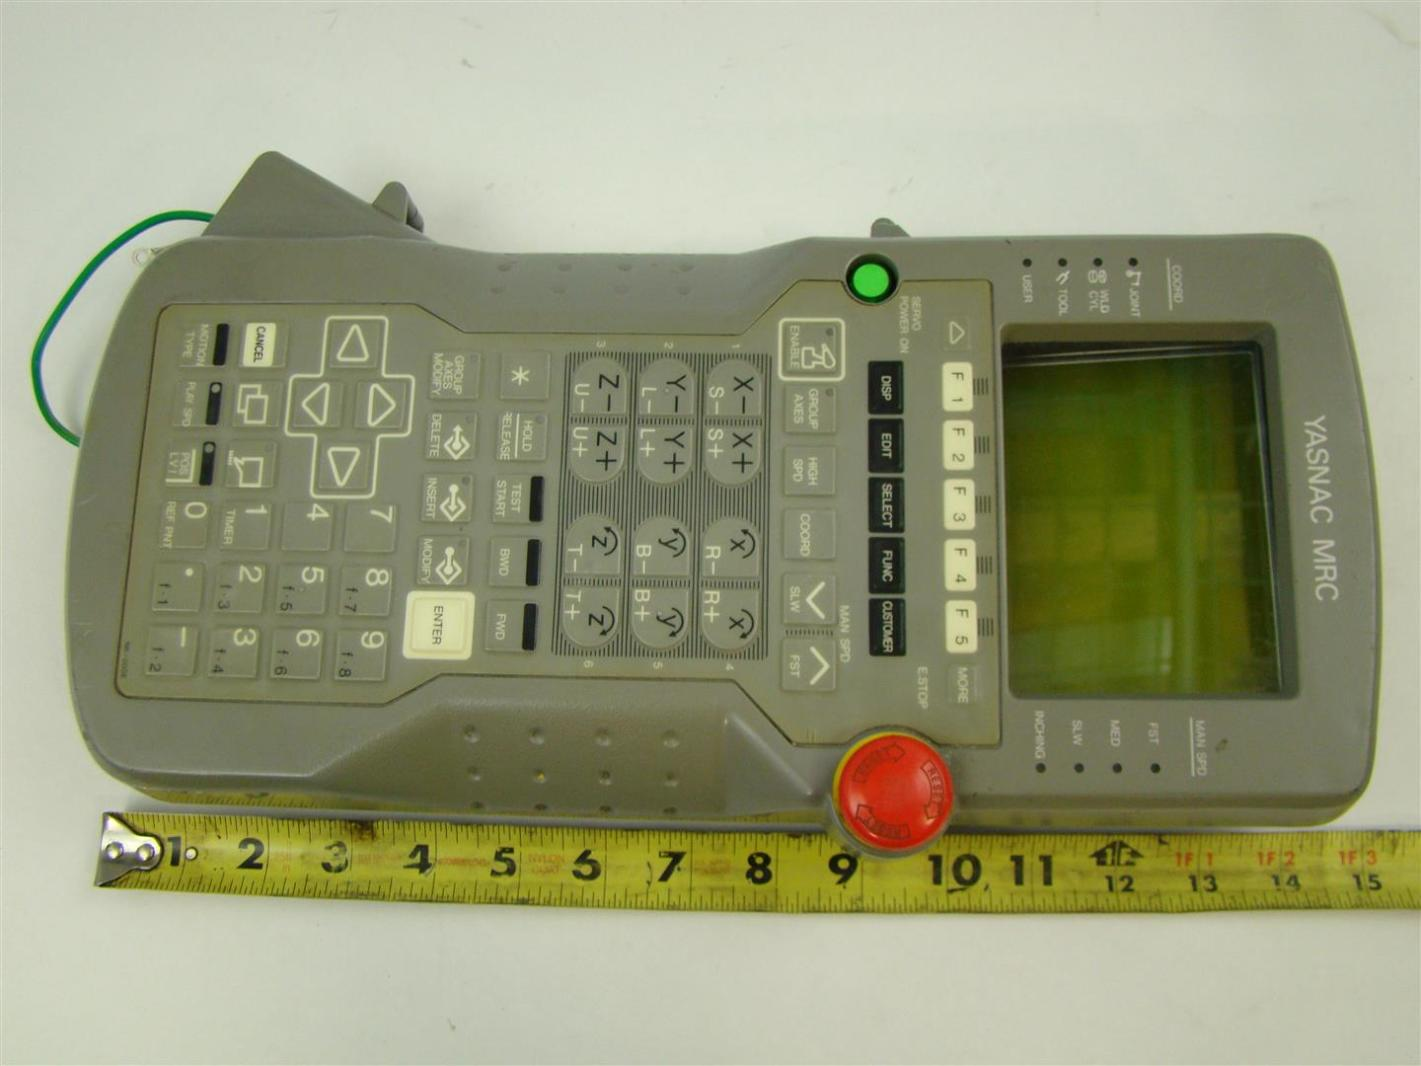 Yasnac mrc jznc mpp20e pendant controller ebay yasnac mrc jznc mpp20e pendant controller aloadofball Choice Image